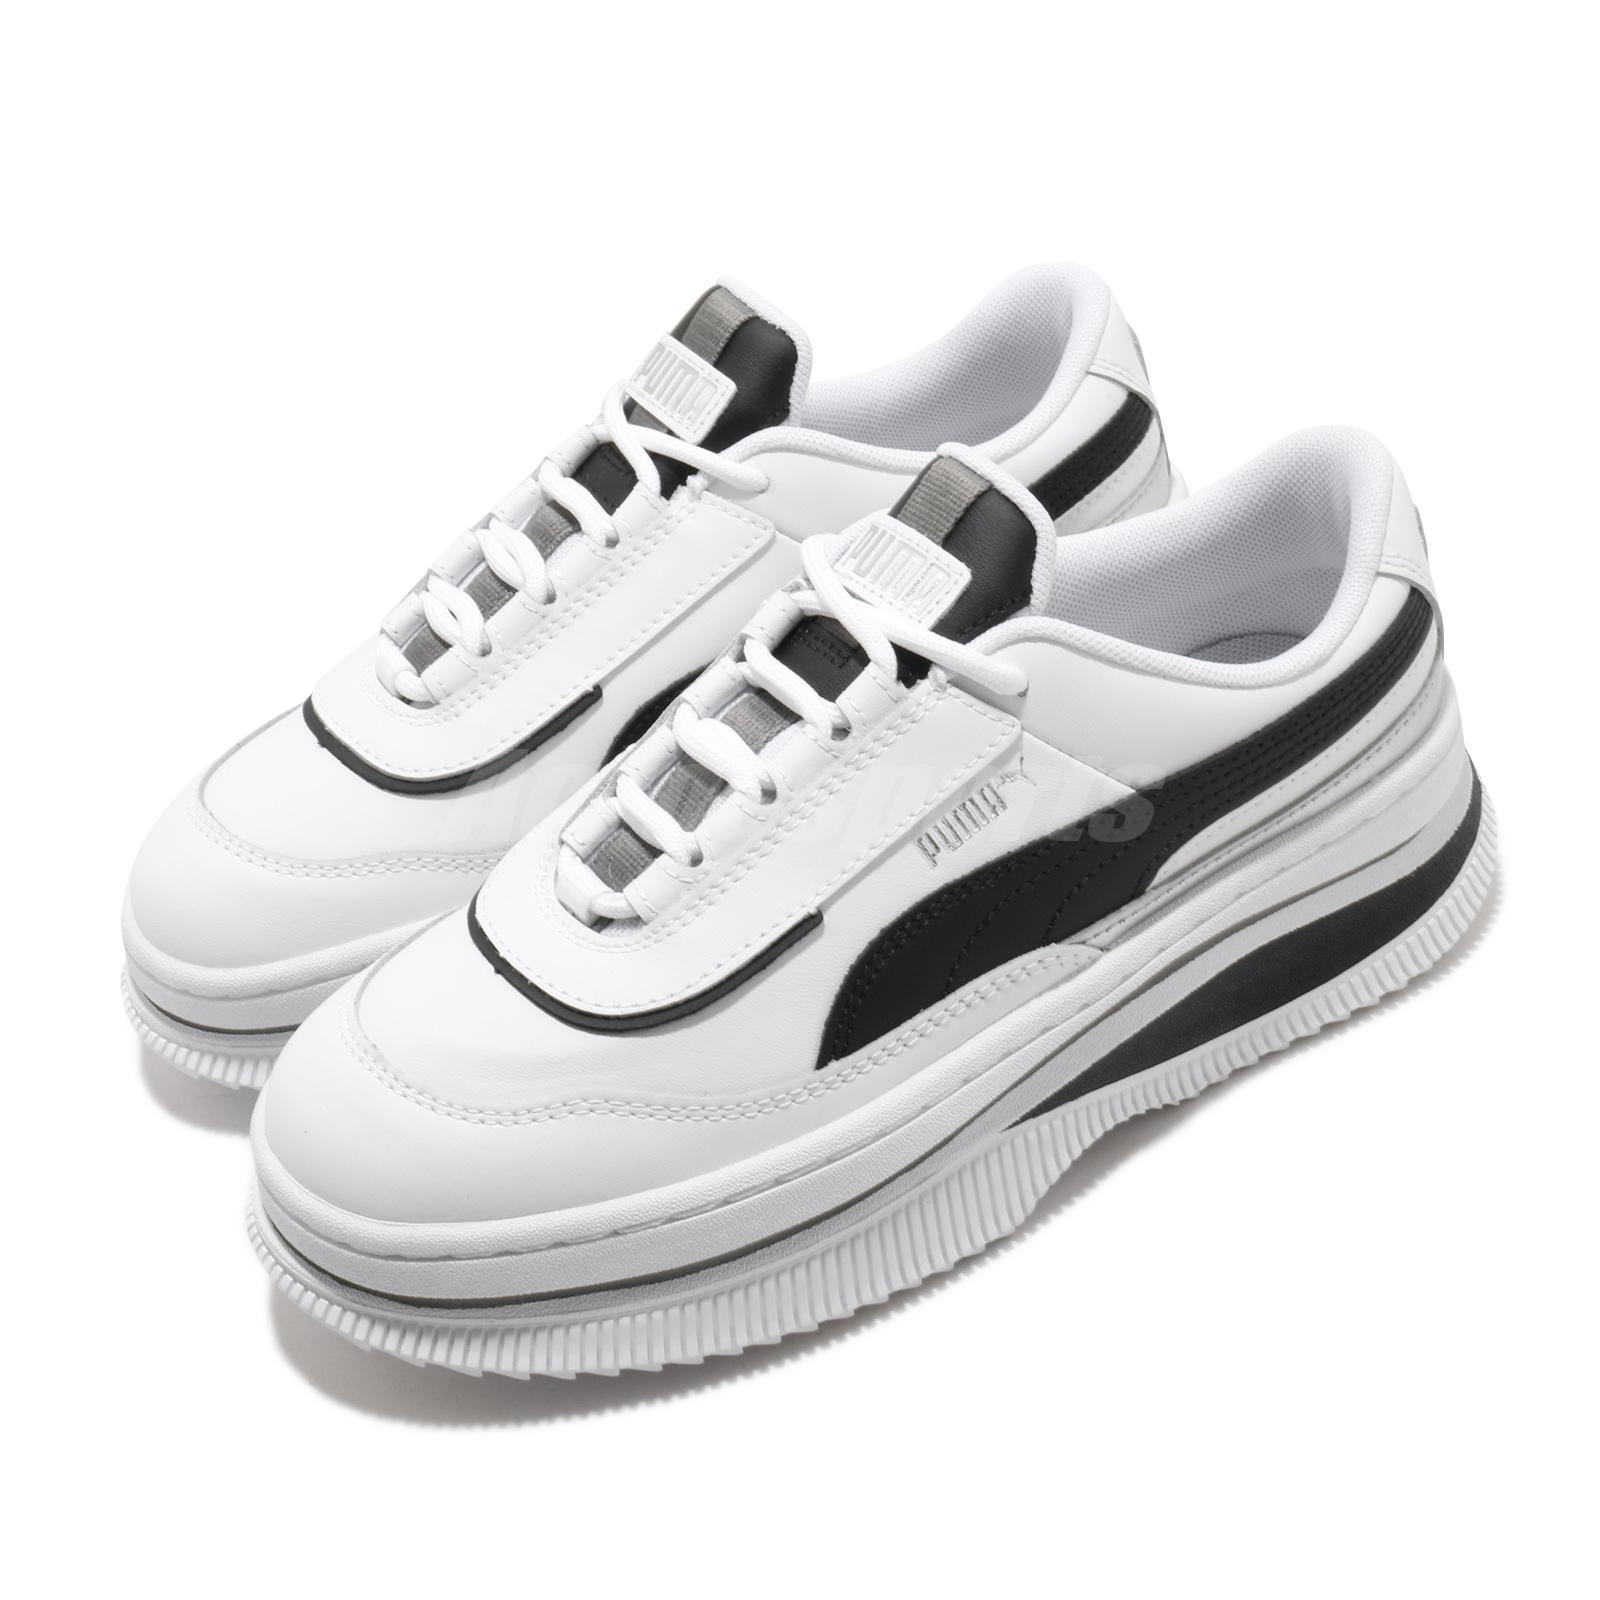 OMP OMPIC//81324139 Sneaker Talla 39